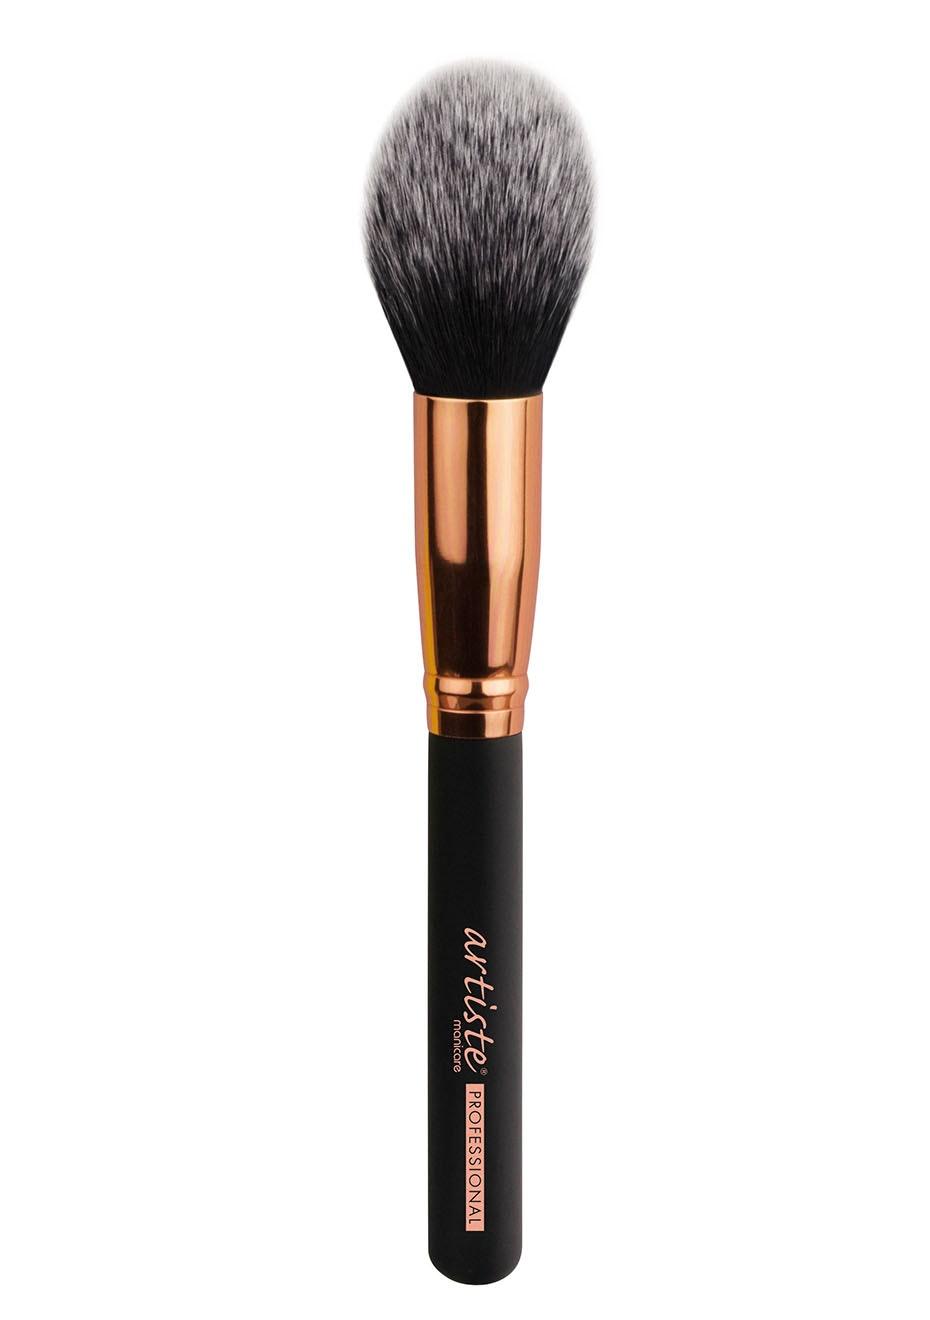 Artiste - Airbrush Soft Focus Blush Brush A03